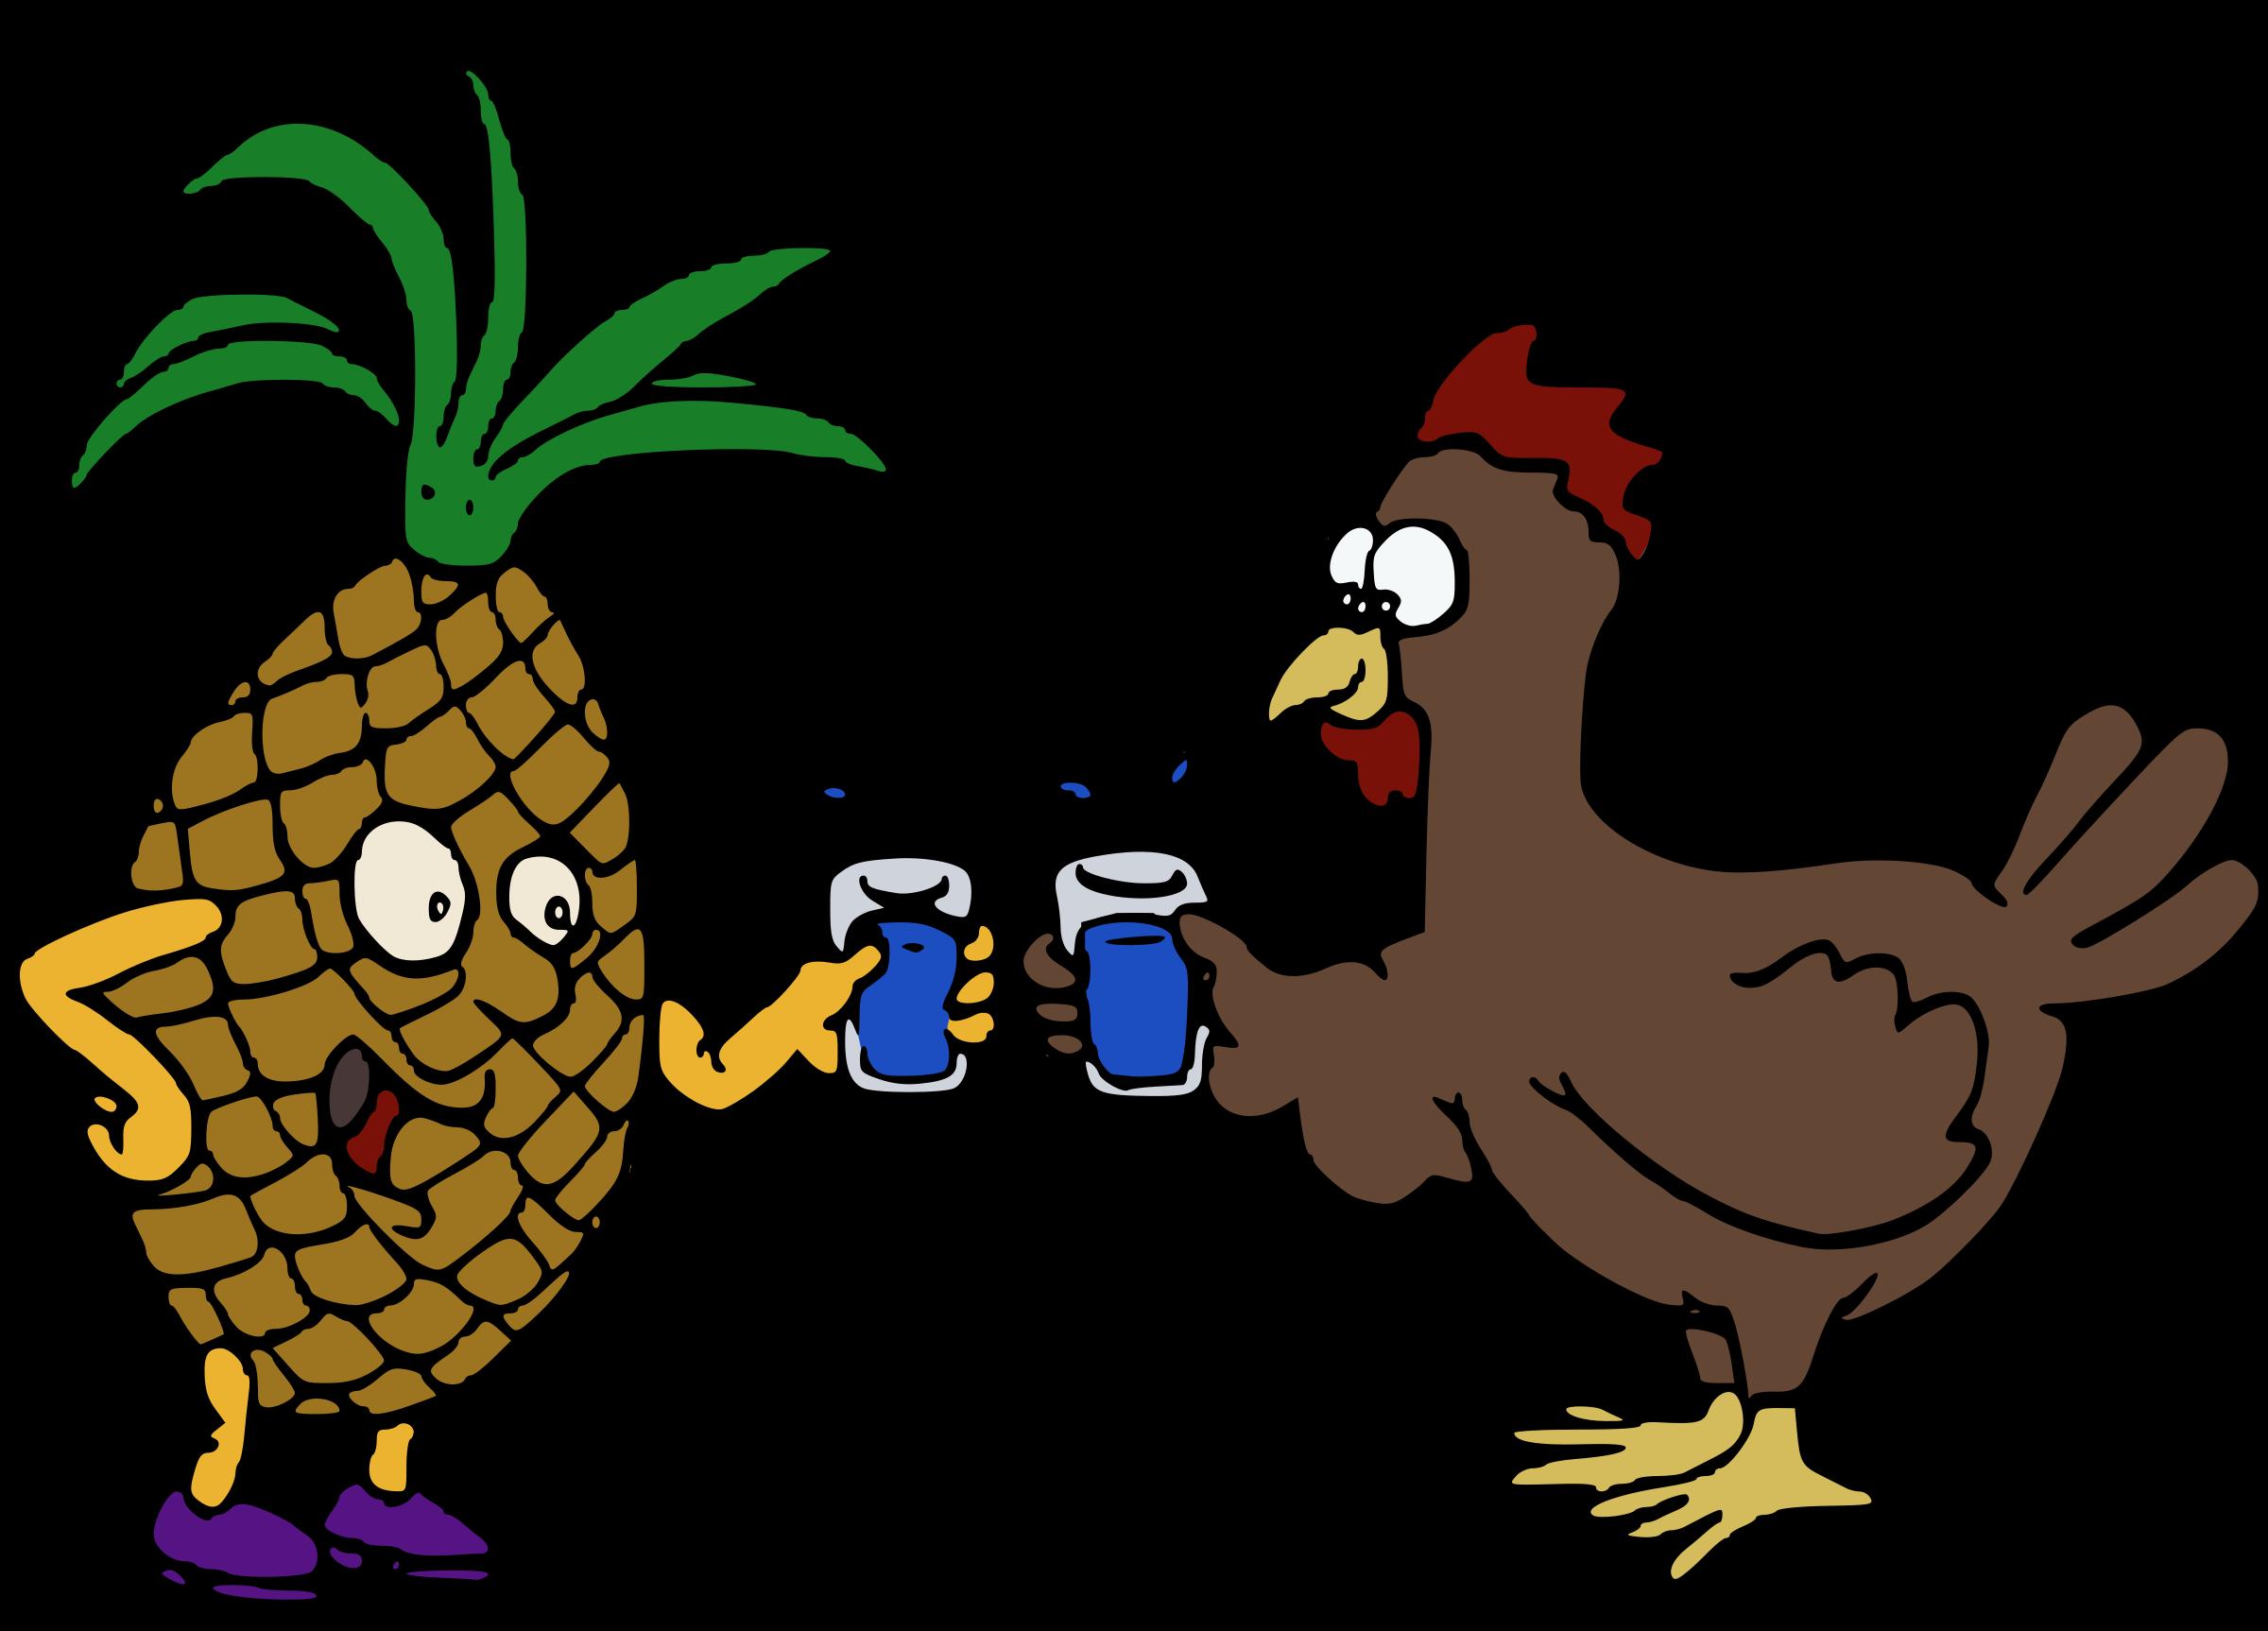 Pineapple basic